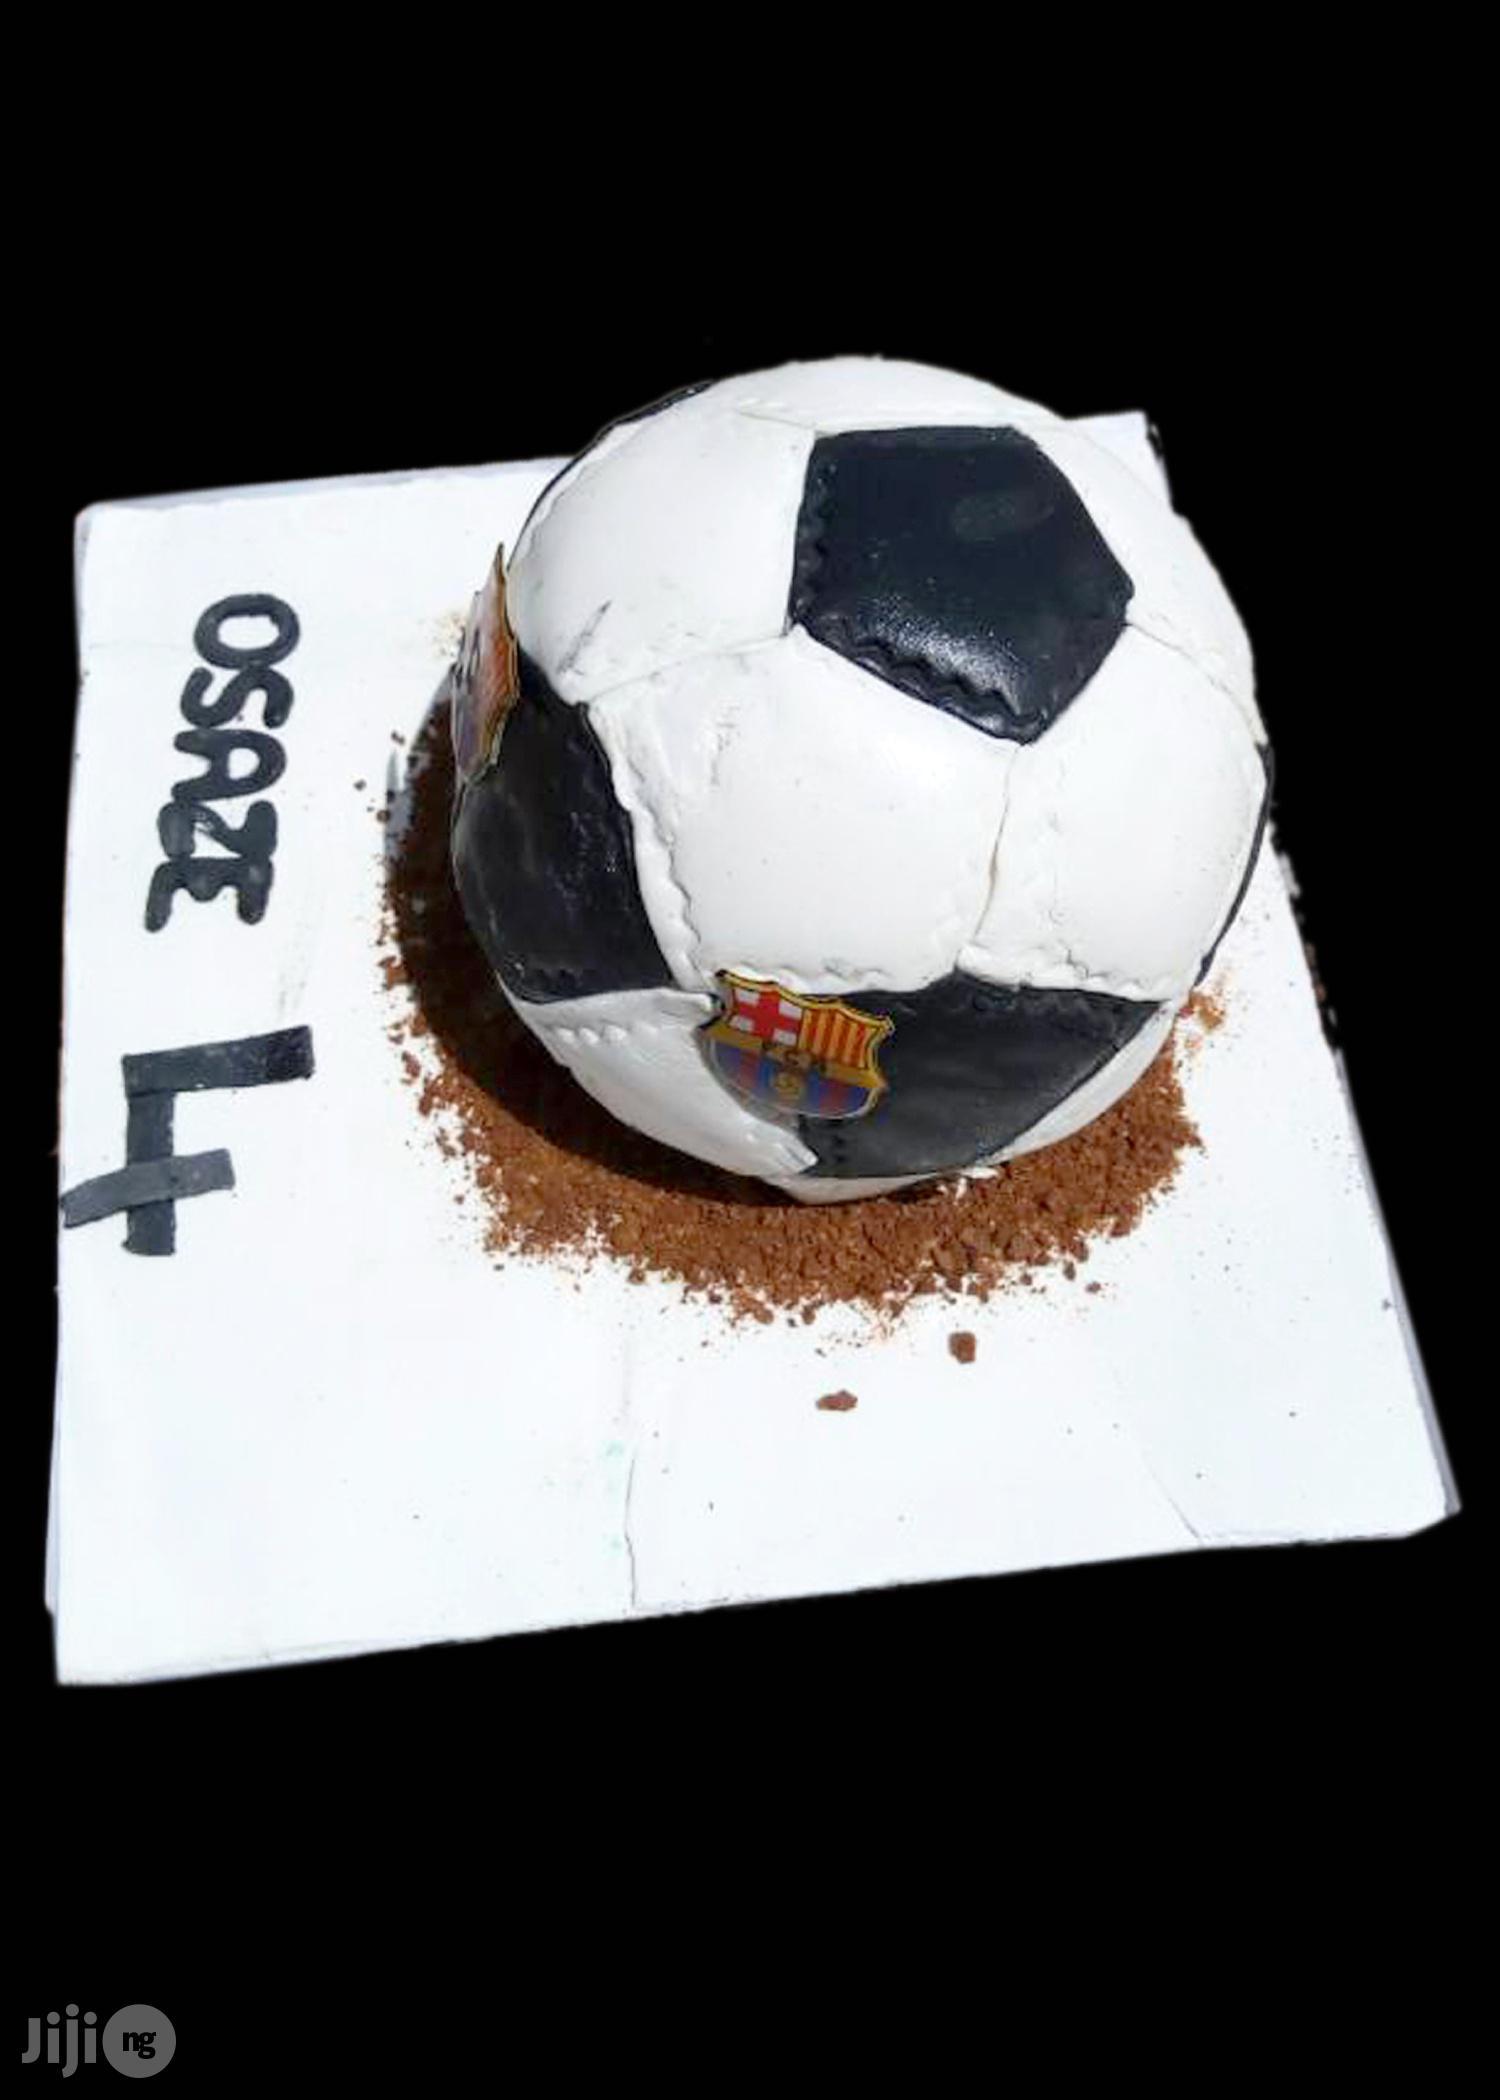 Birthday Cakes | Meals & Drinks for sale in Benin City, Edo State, Nigeria